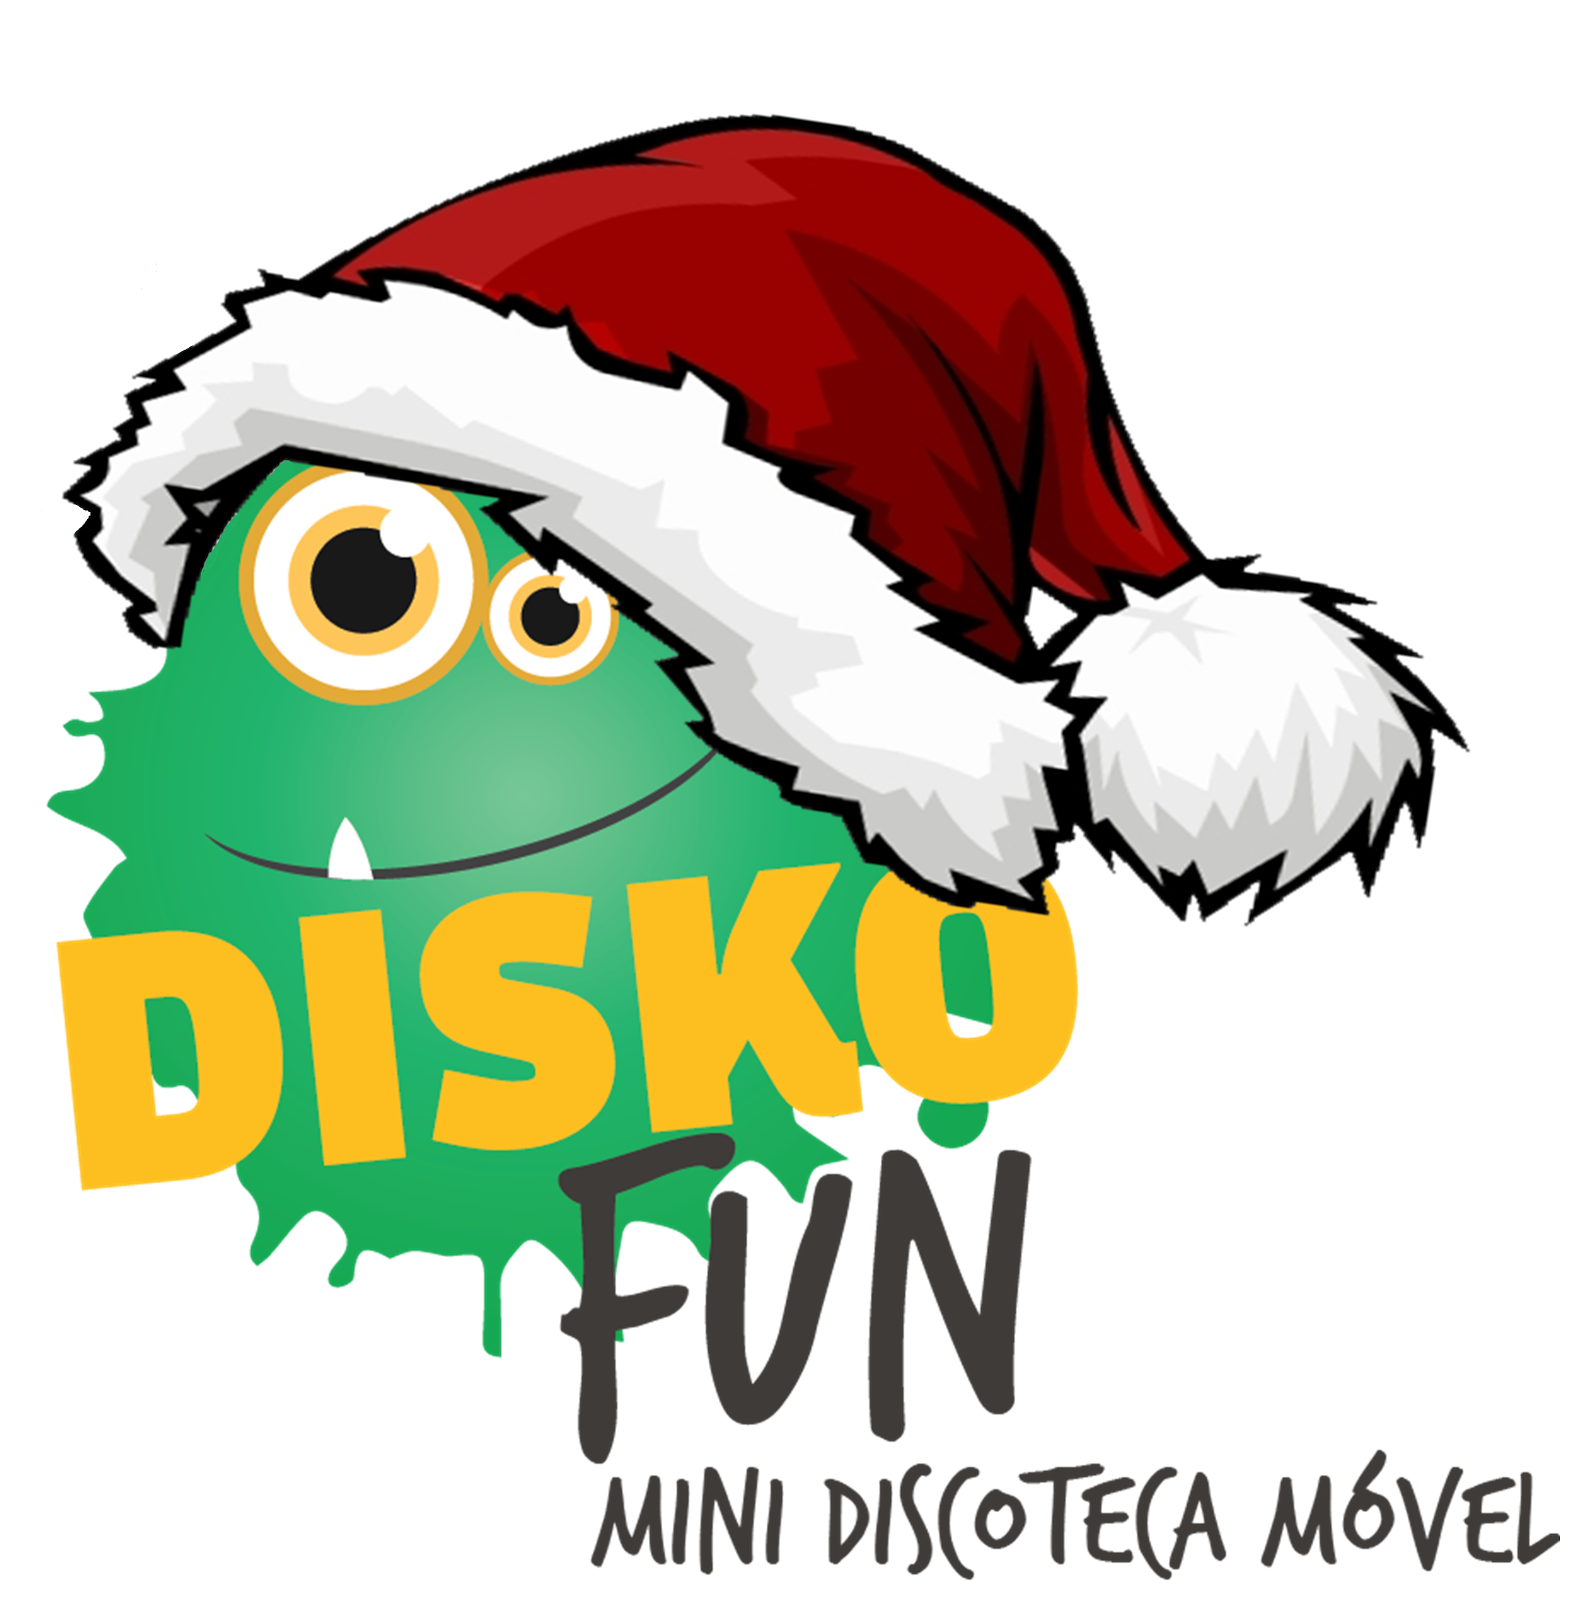 Diskofun - Mini Discoteca Móvel